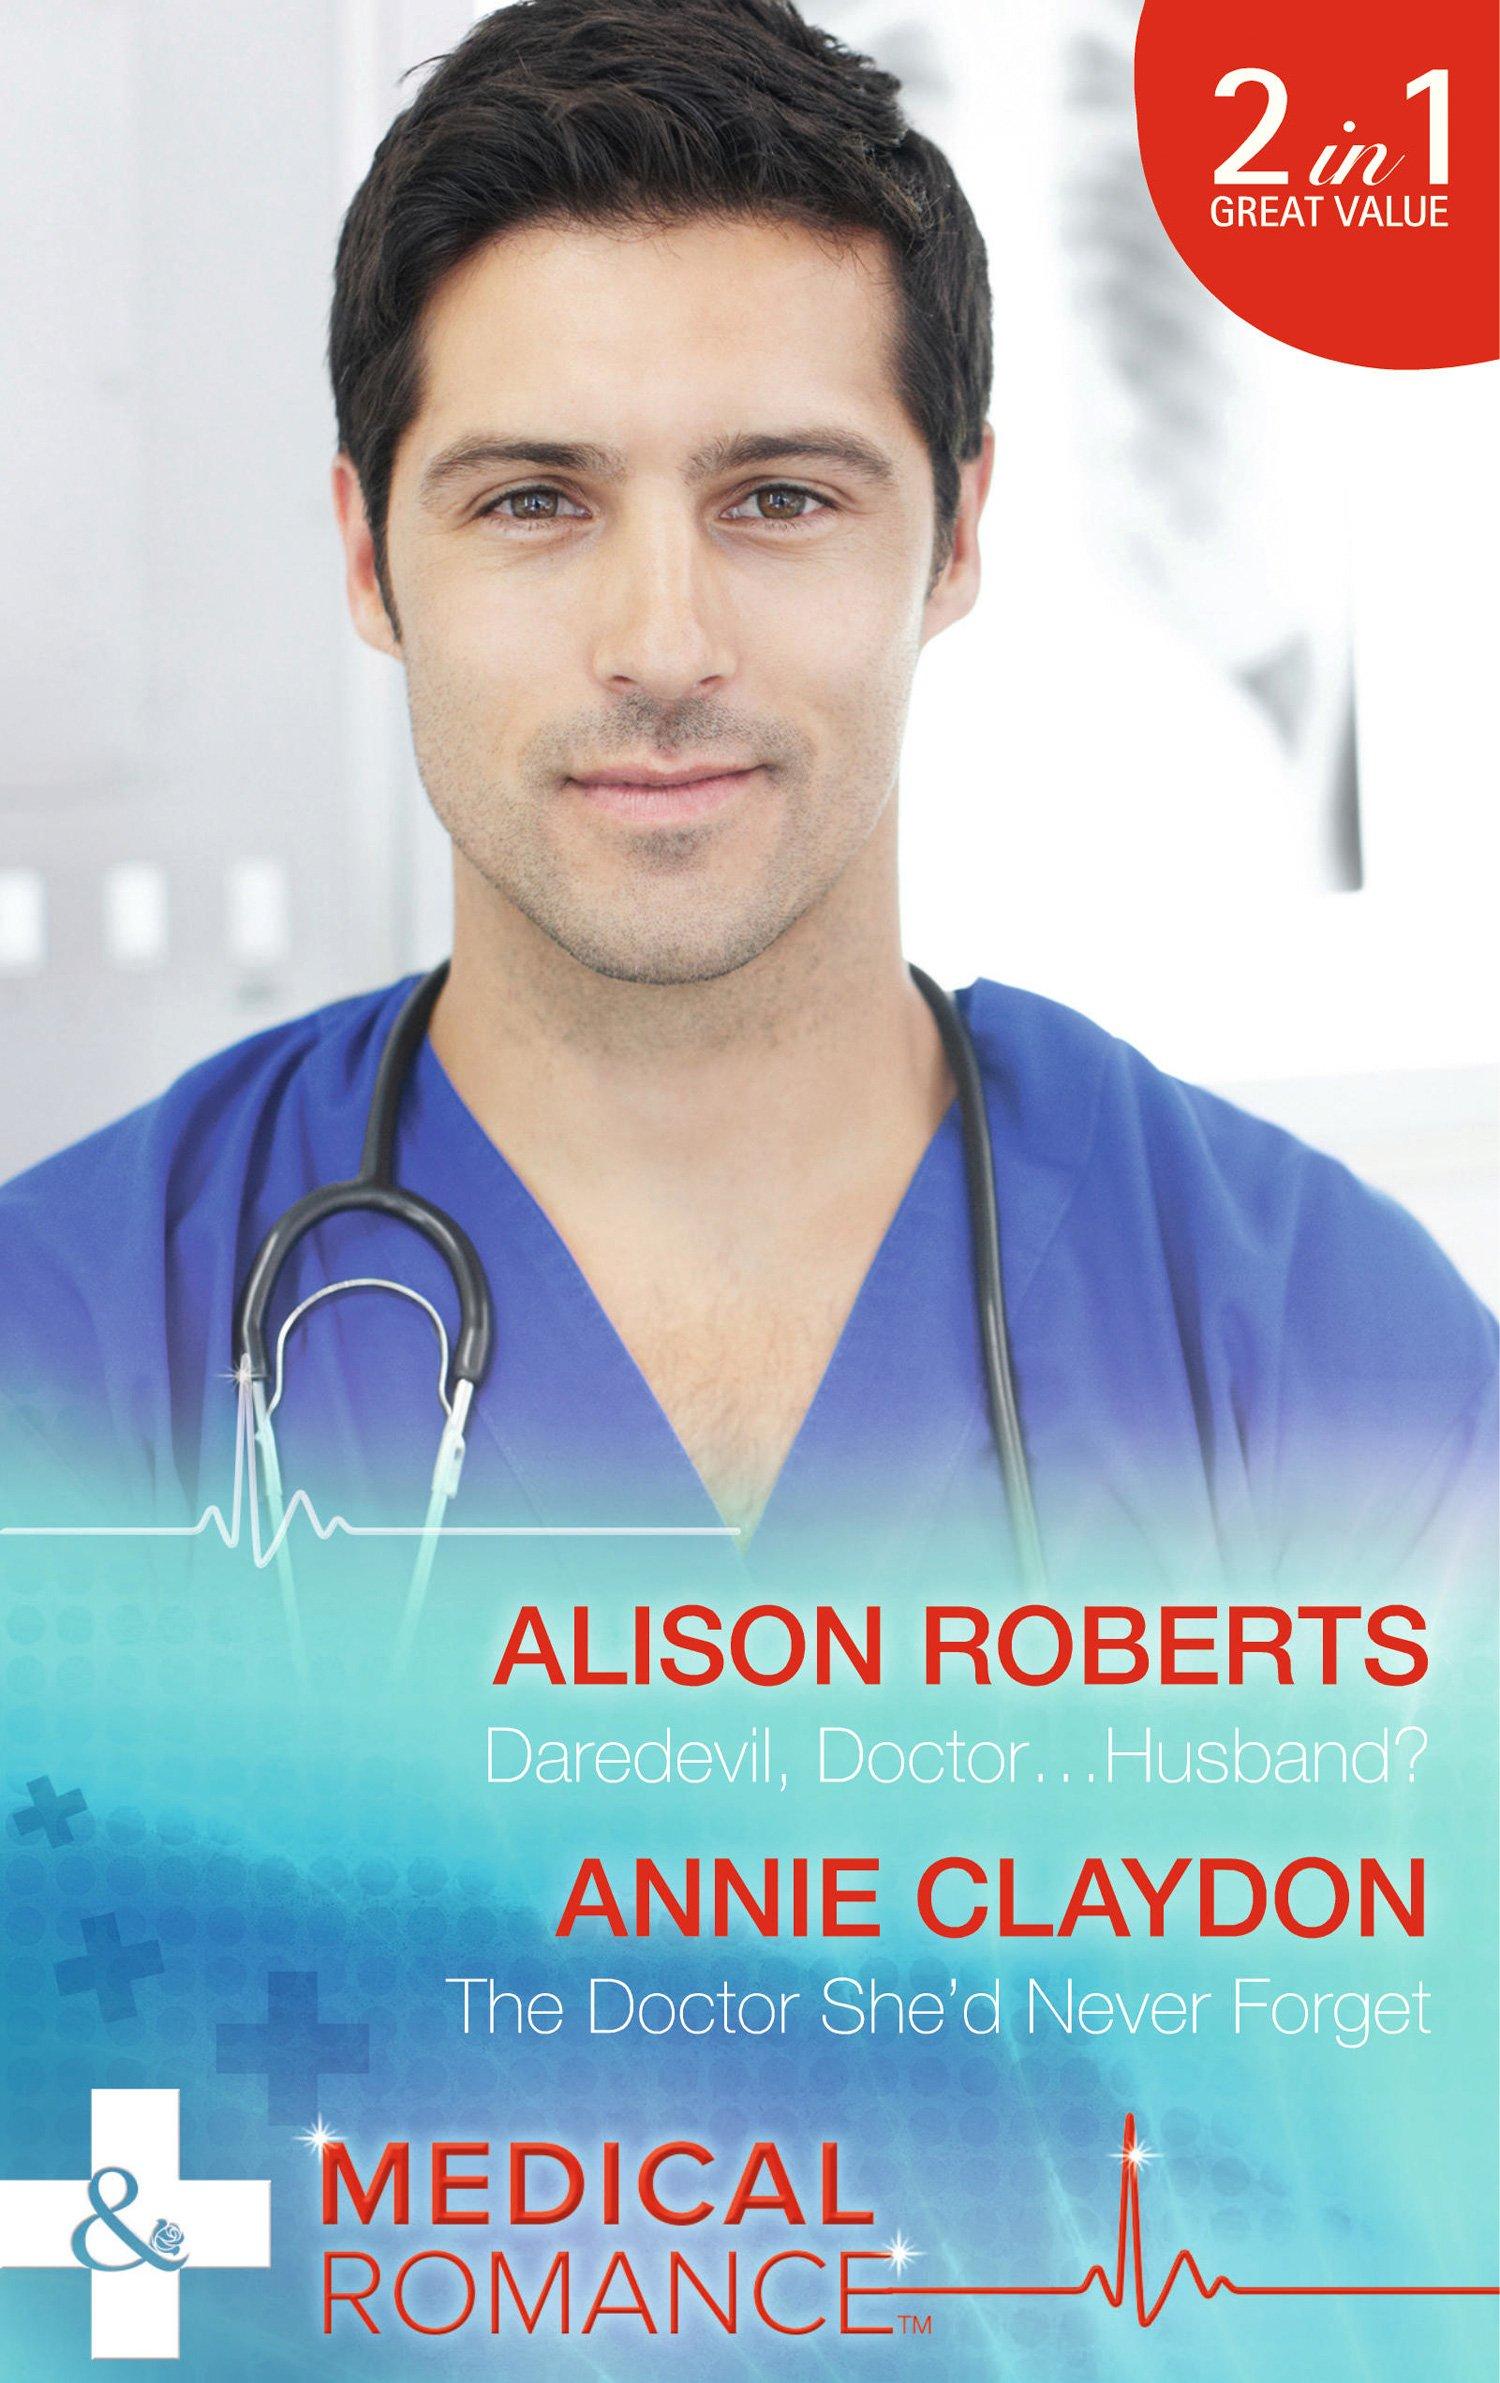 Daredevil, Doctor...Husband? by Annie Claydon, Alison Roberts